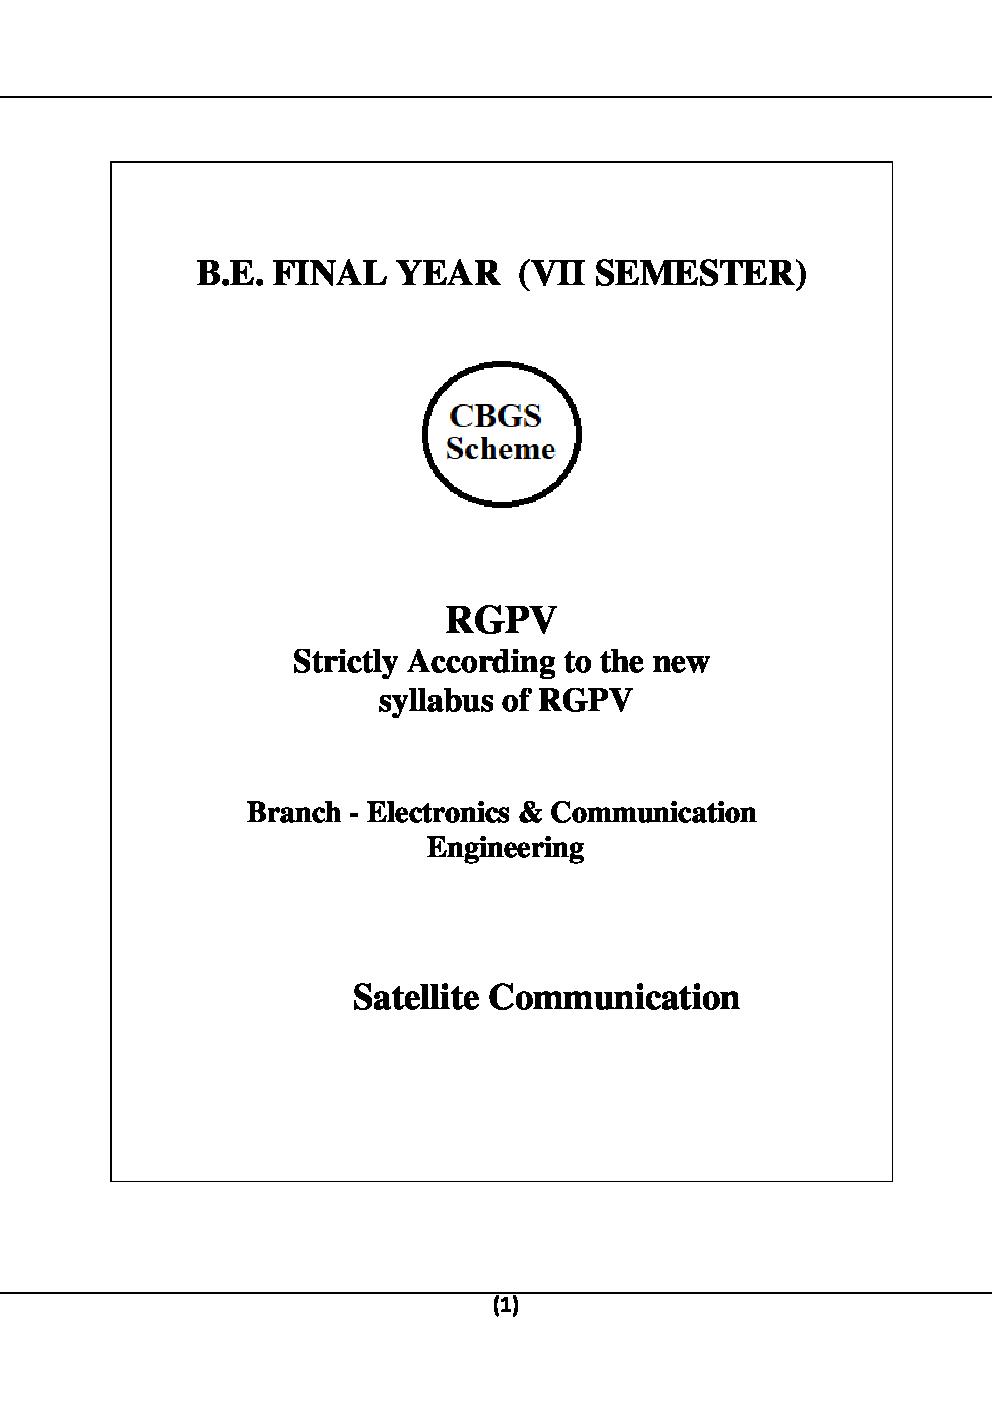 Satelite Communication For RGPV B.E. 7th Sem Electronics & Communication Engineering - Page 2